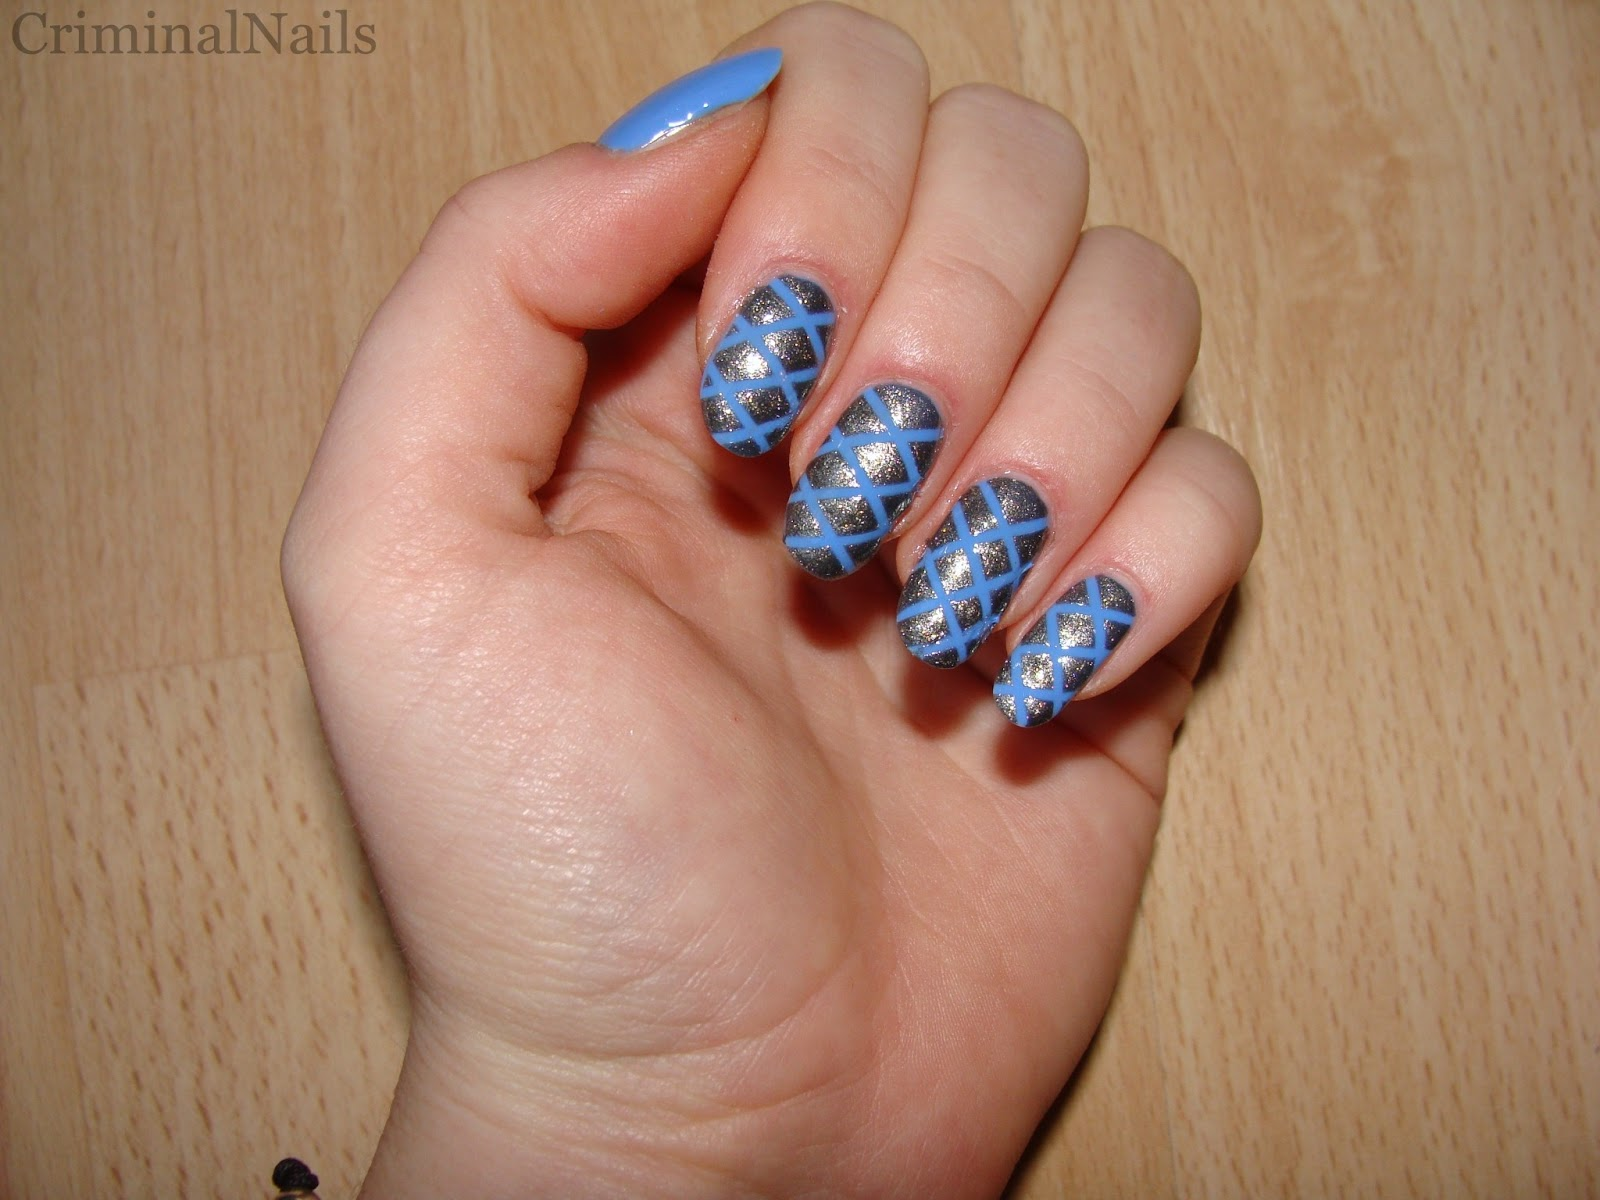 Criminal Nails: enero 2013